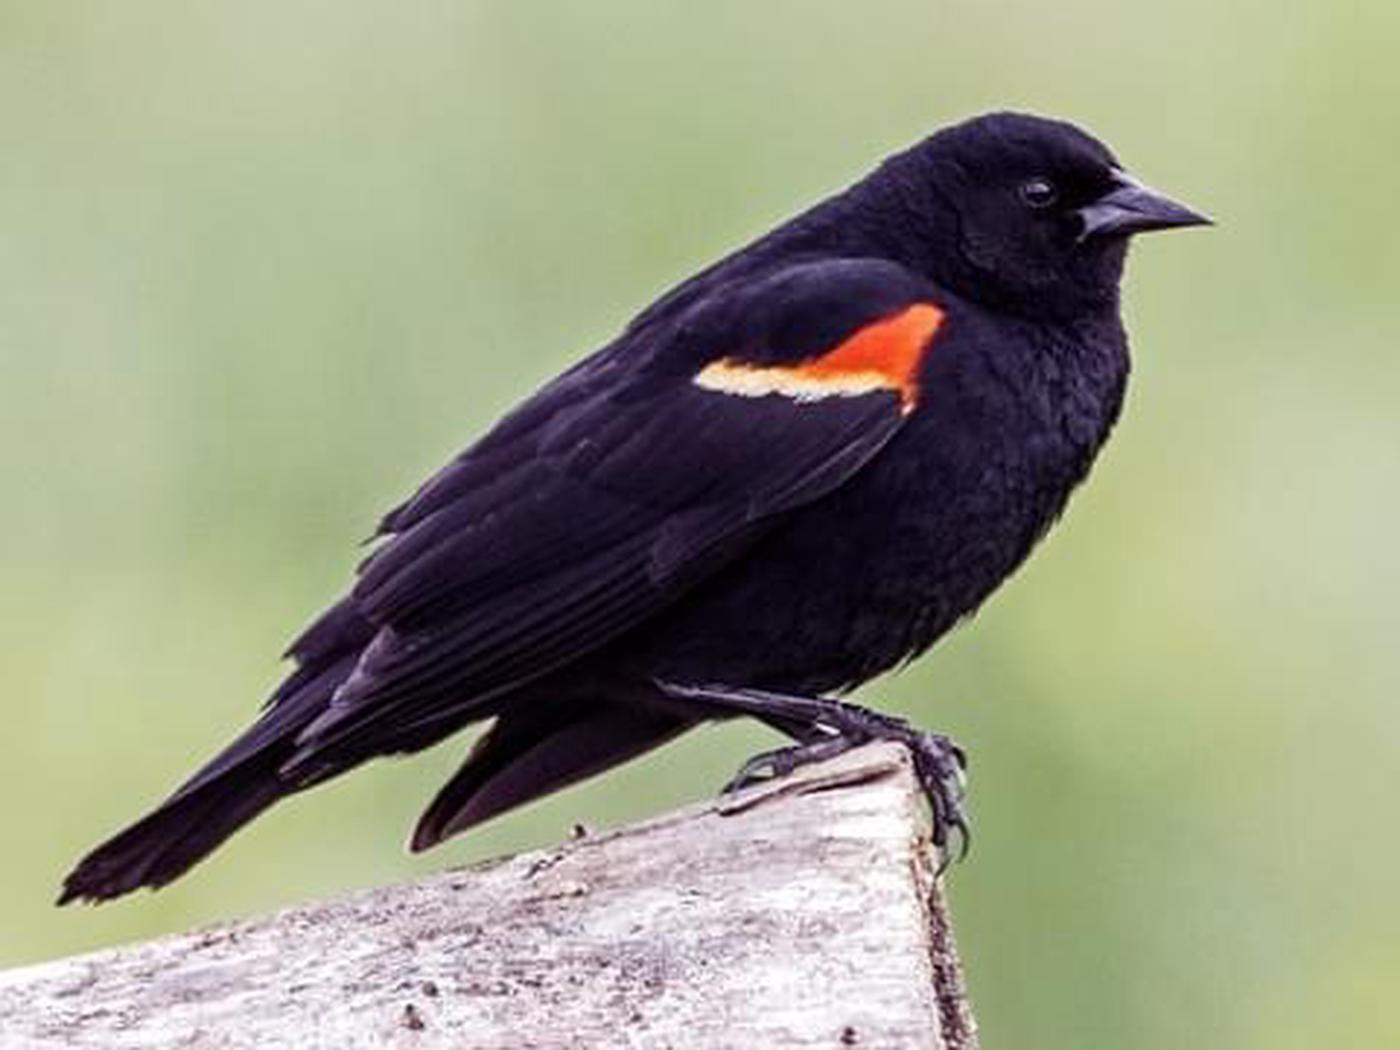 Birding at Lake Meredith